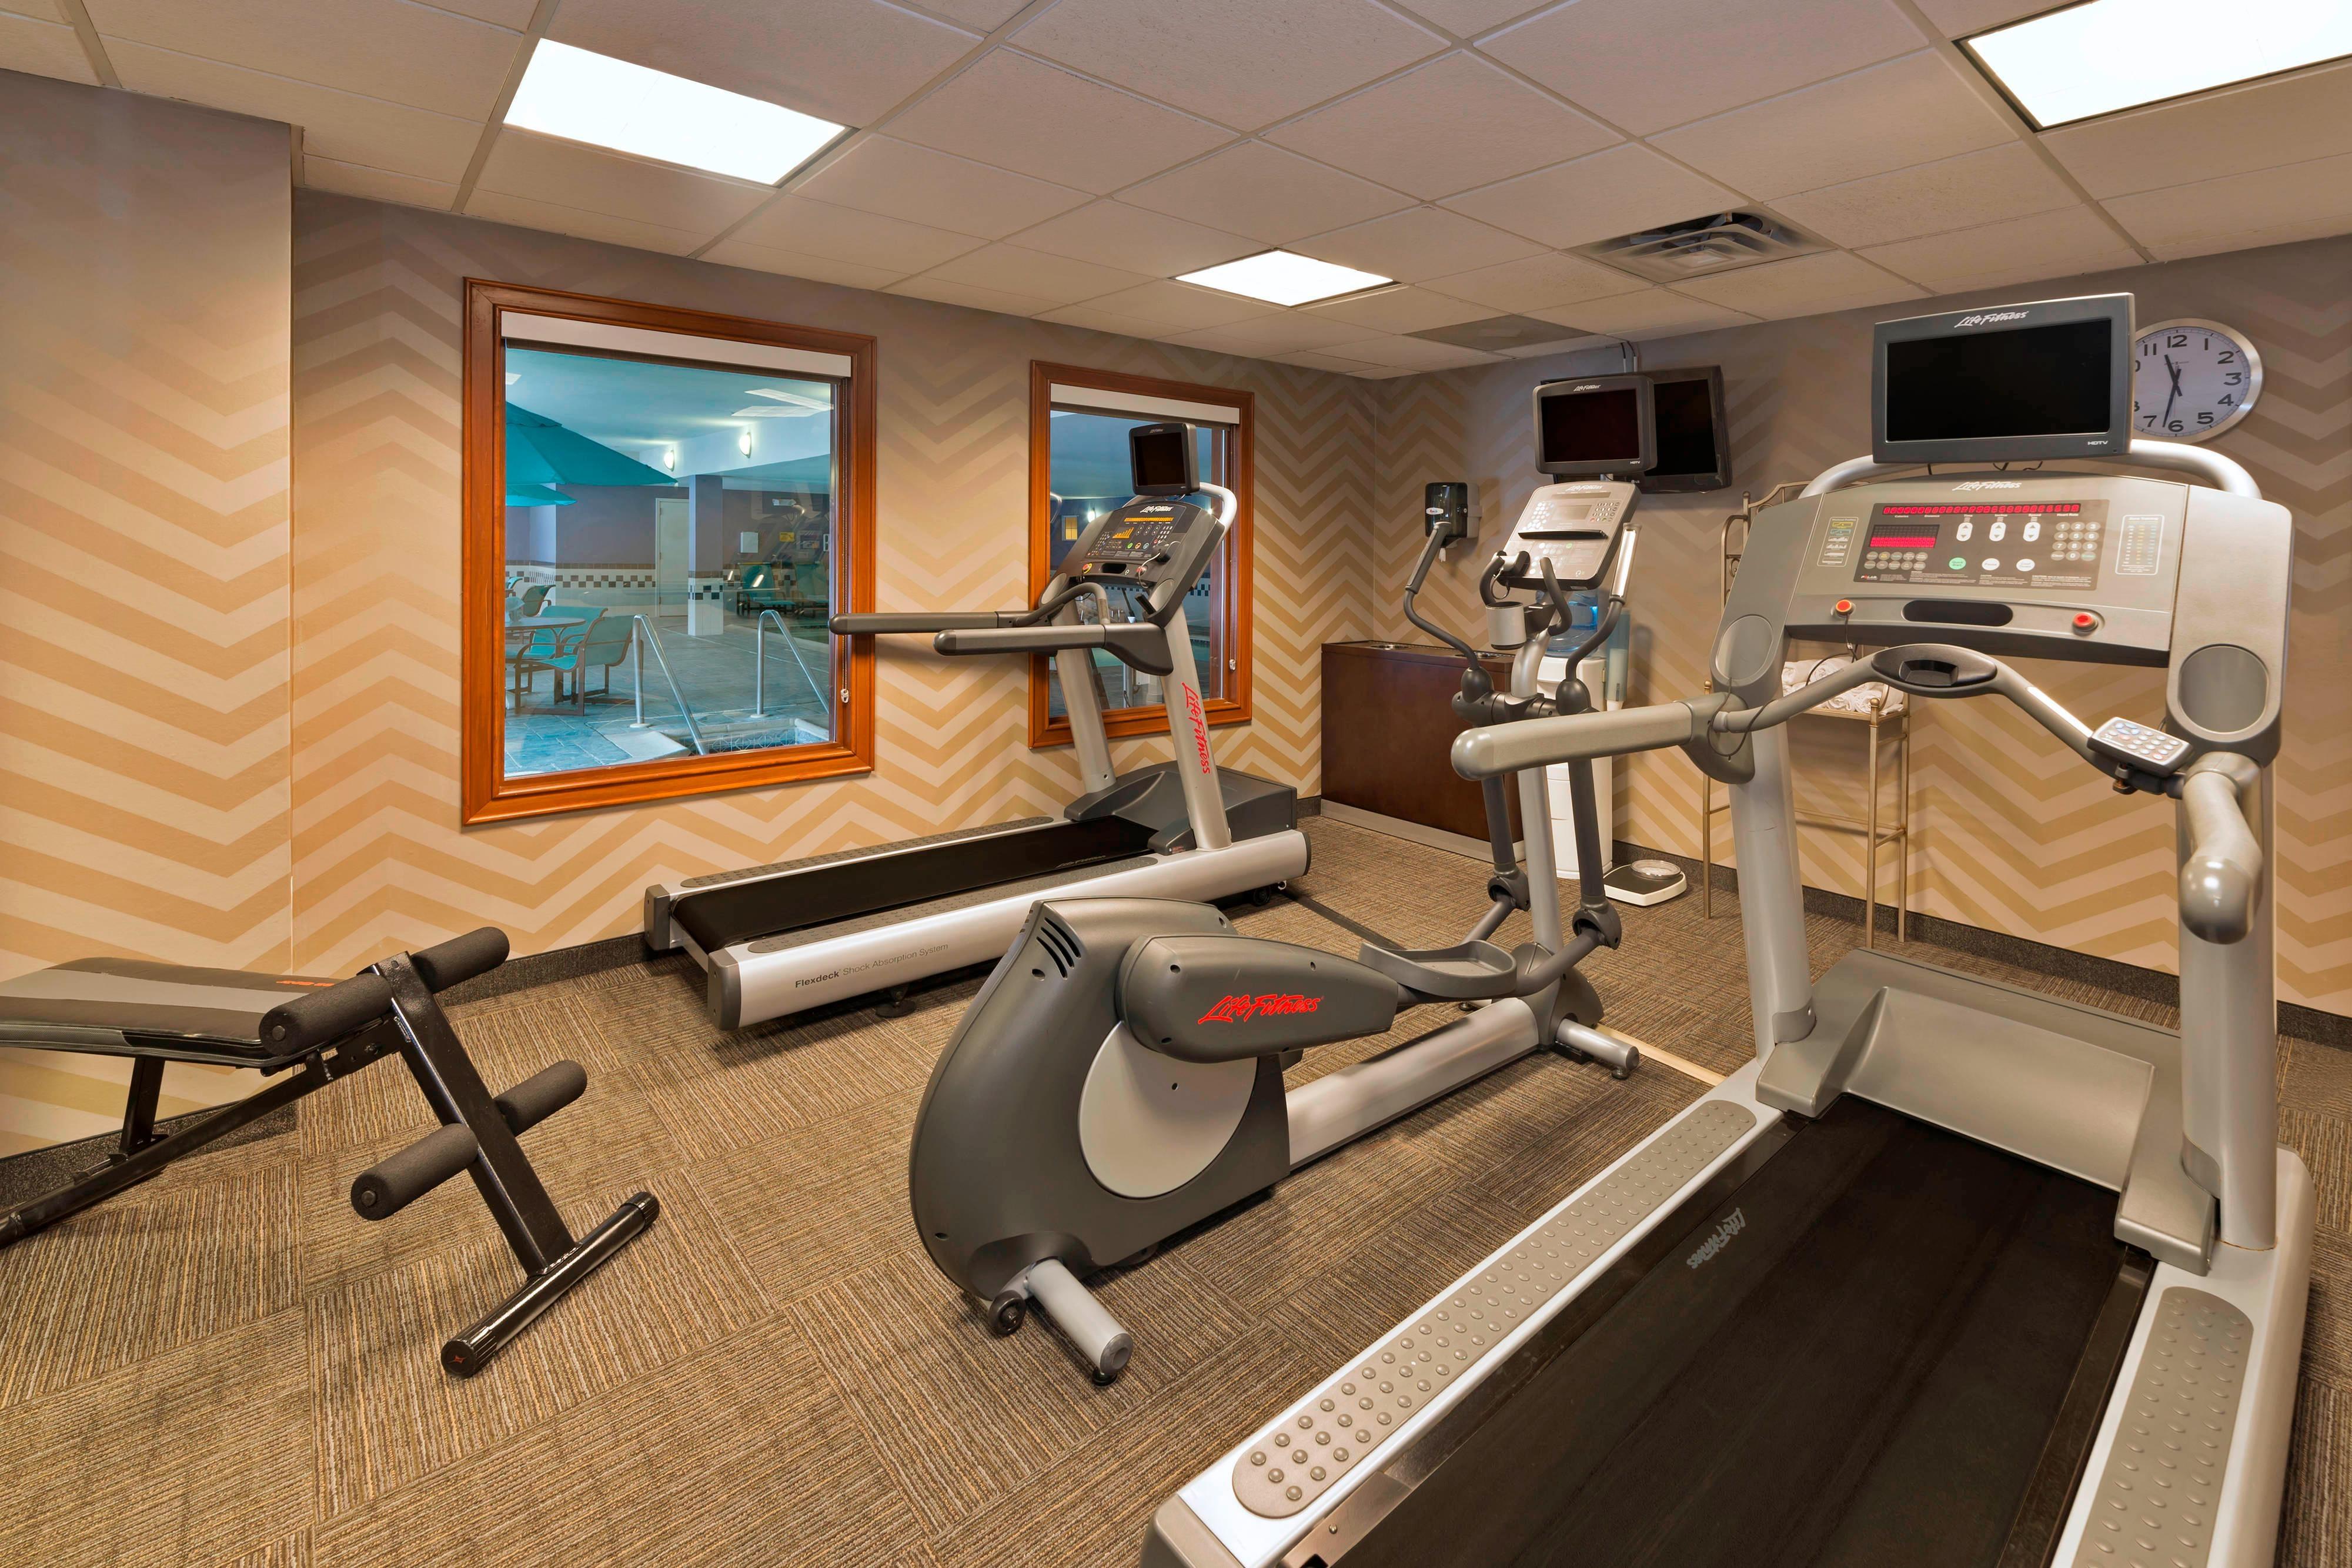 mt olive hotel gym